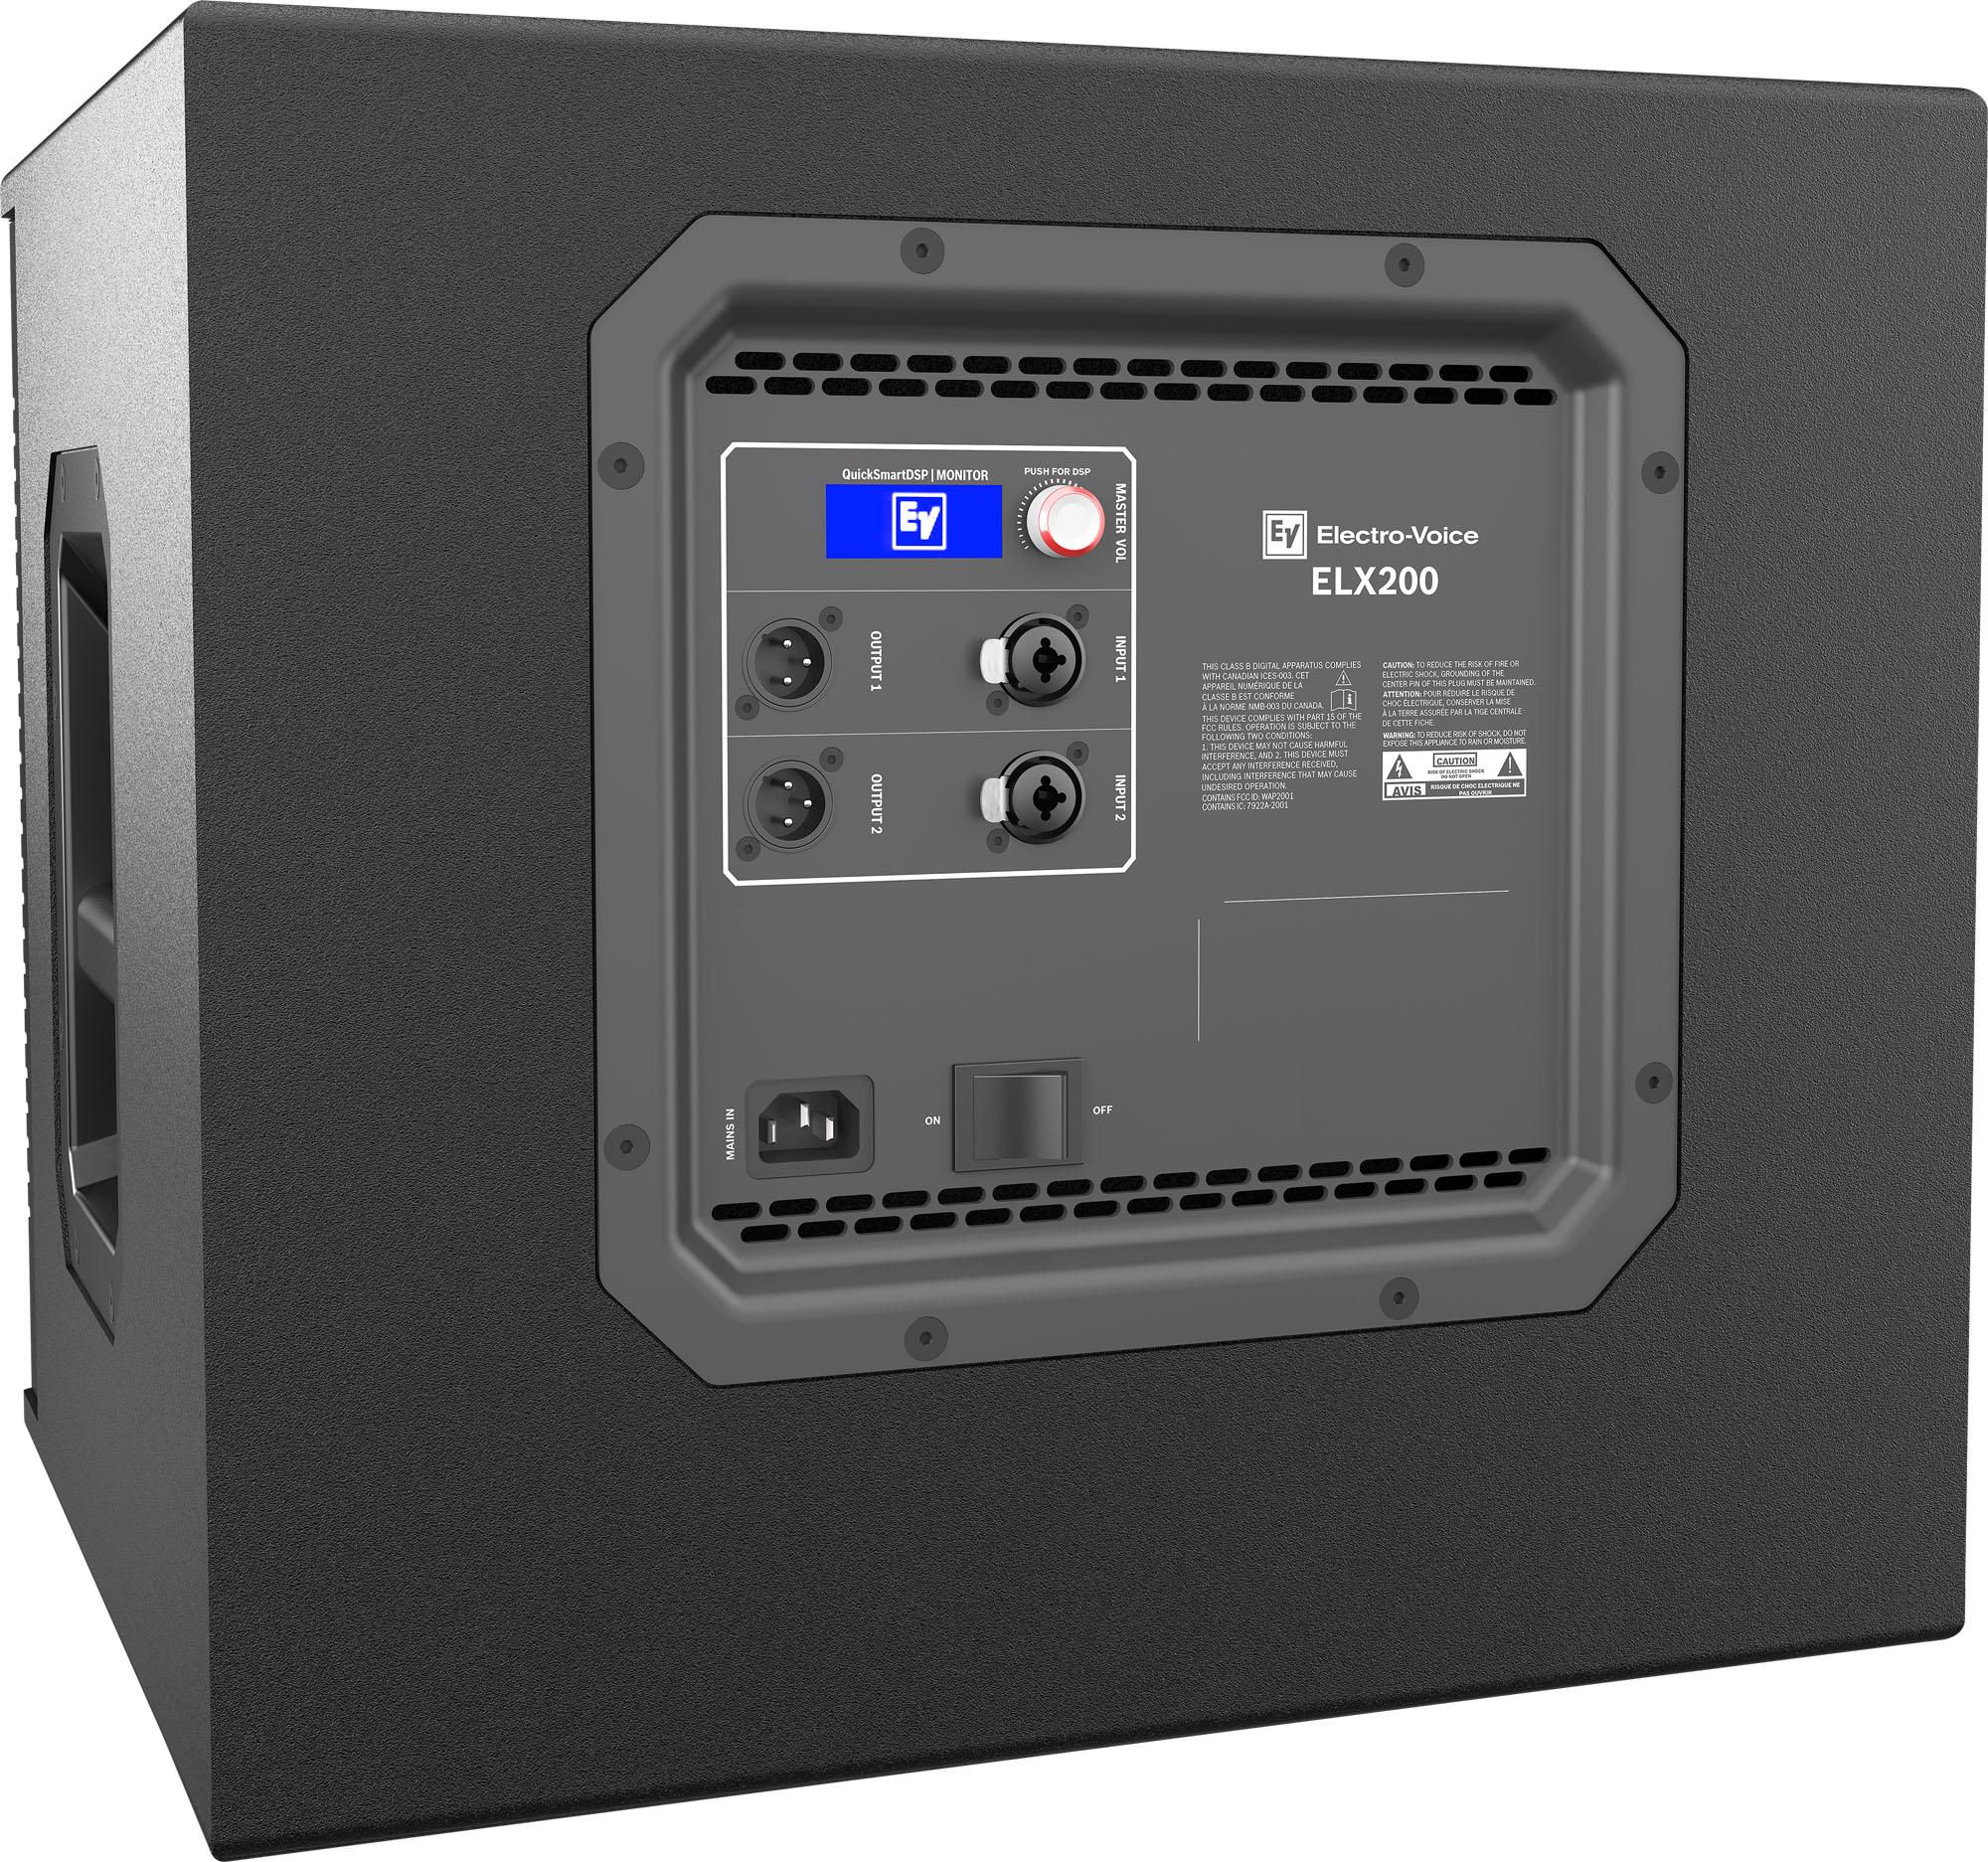 Electro-Voice ELX200 - نمای پشت ساب ووفر های اکتیو و پسیو حرفه ای